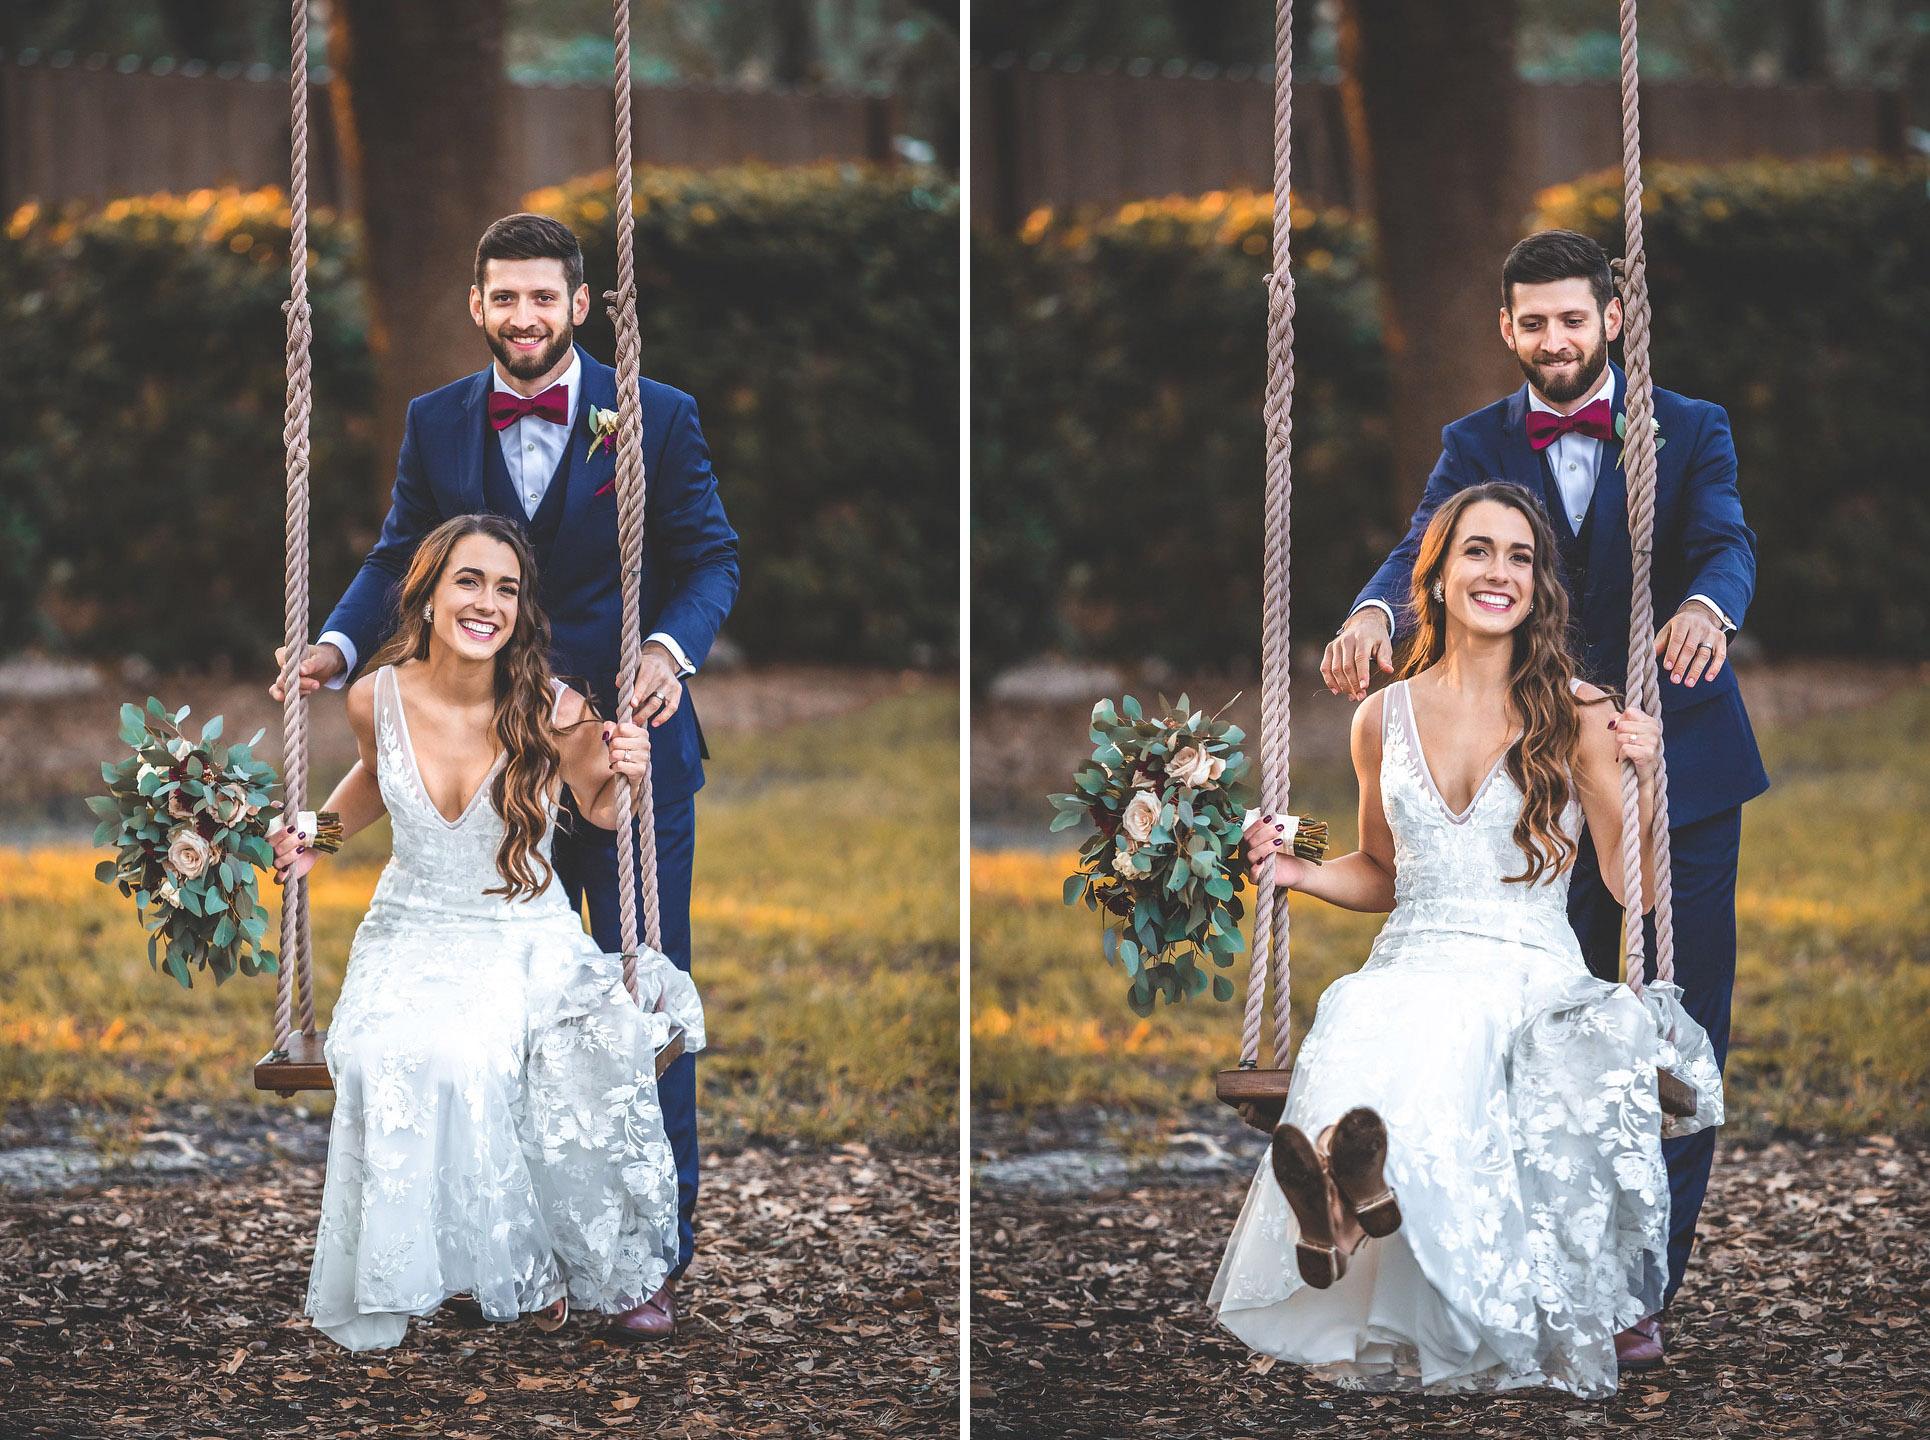 adam-szarmack-bowing-oaks-wedding-photographer-jacksonville-102.jpg